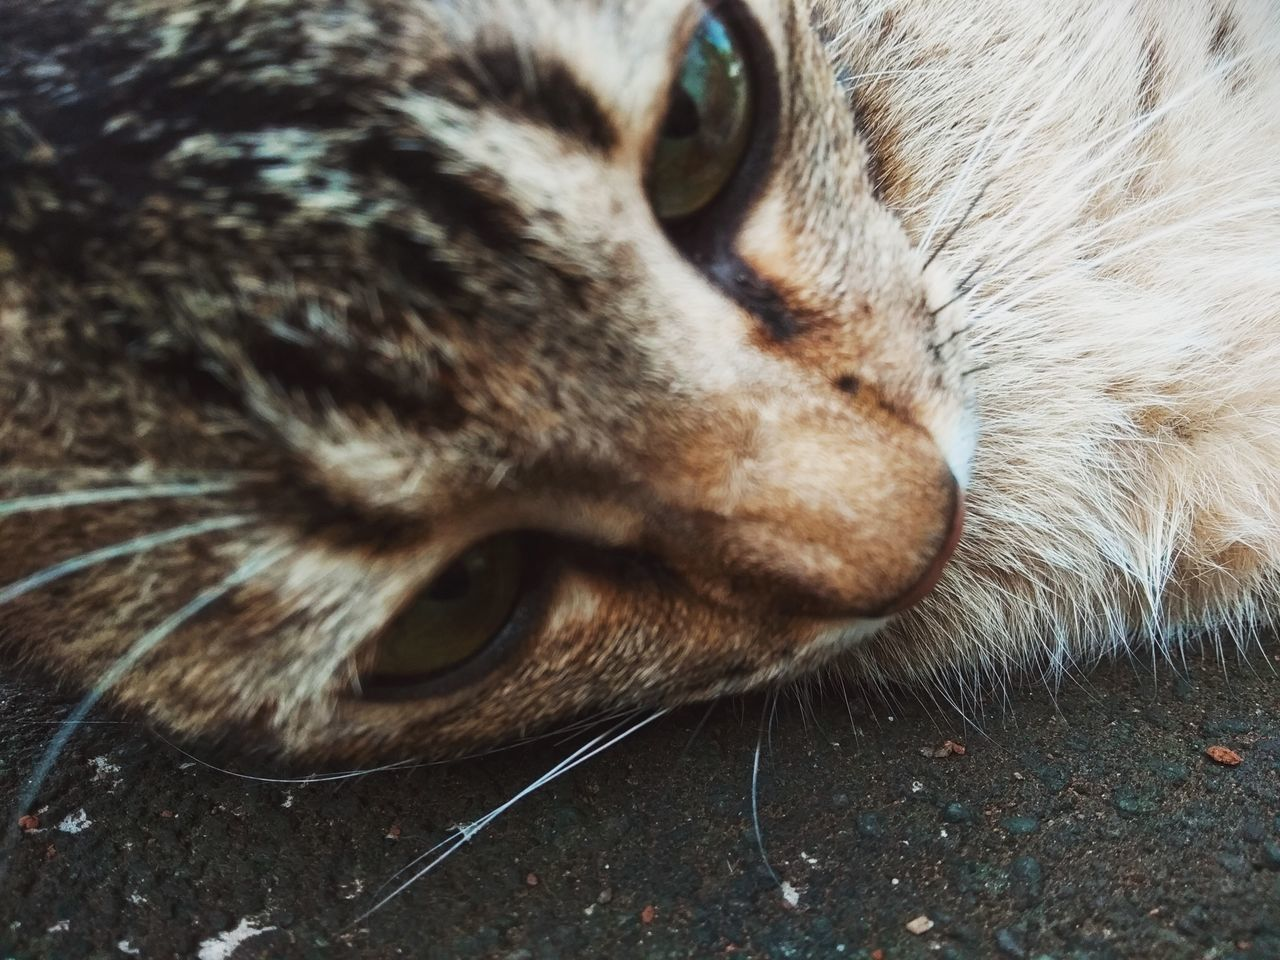 CLOSE-UP OF A CAT LYING